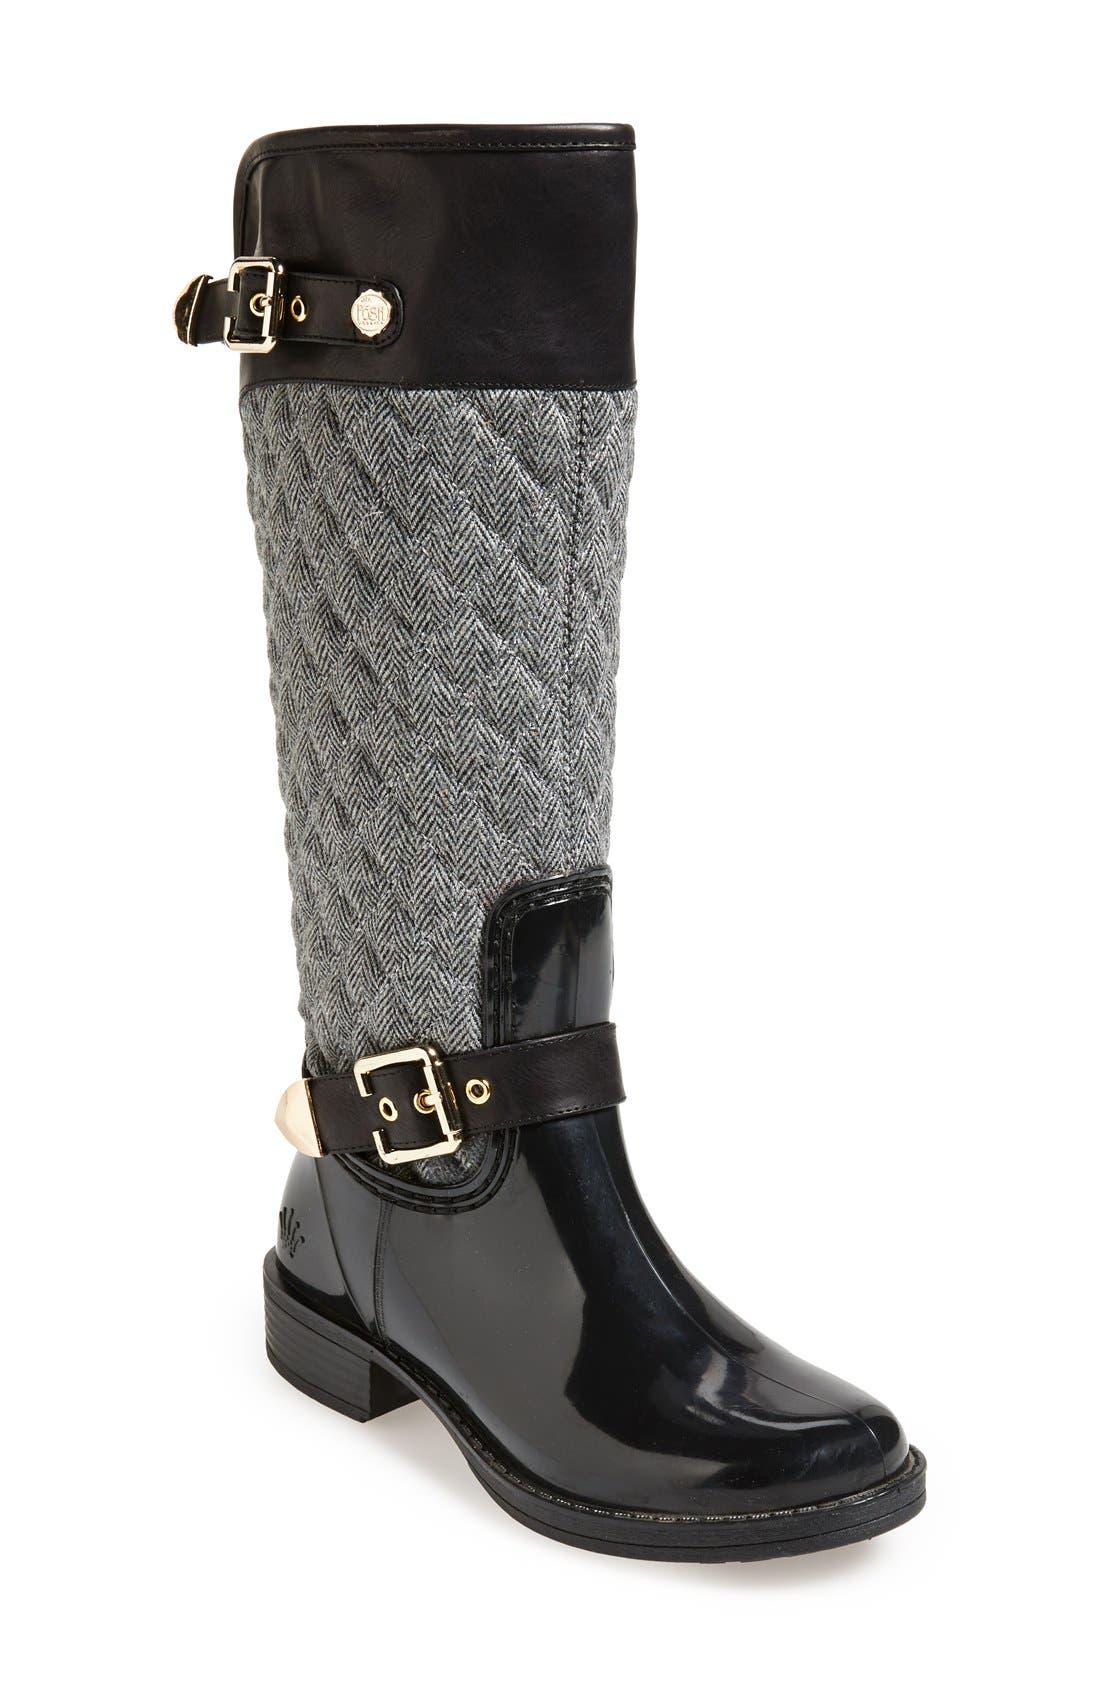 Main Image - Posh Wellies 'Peacon' Quilted Tall Rain Boot (Women)